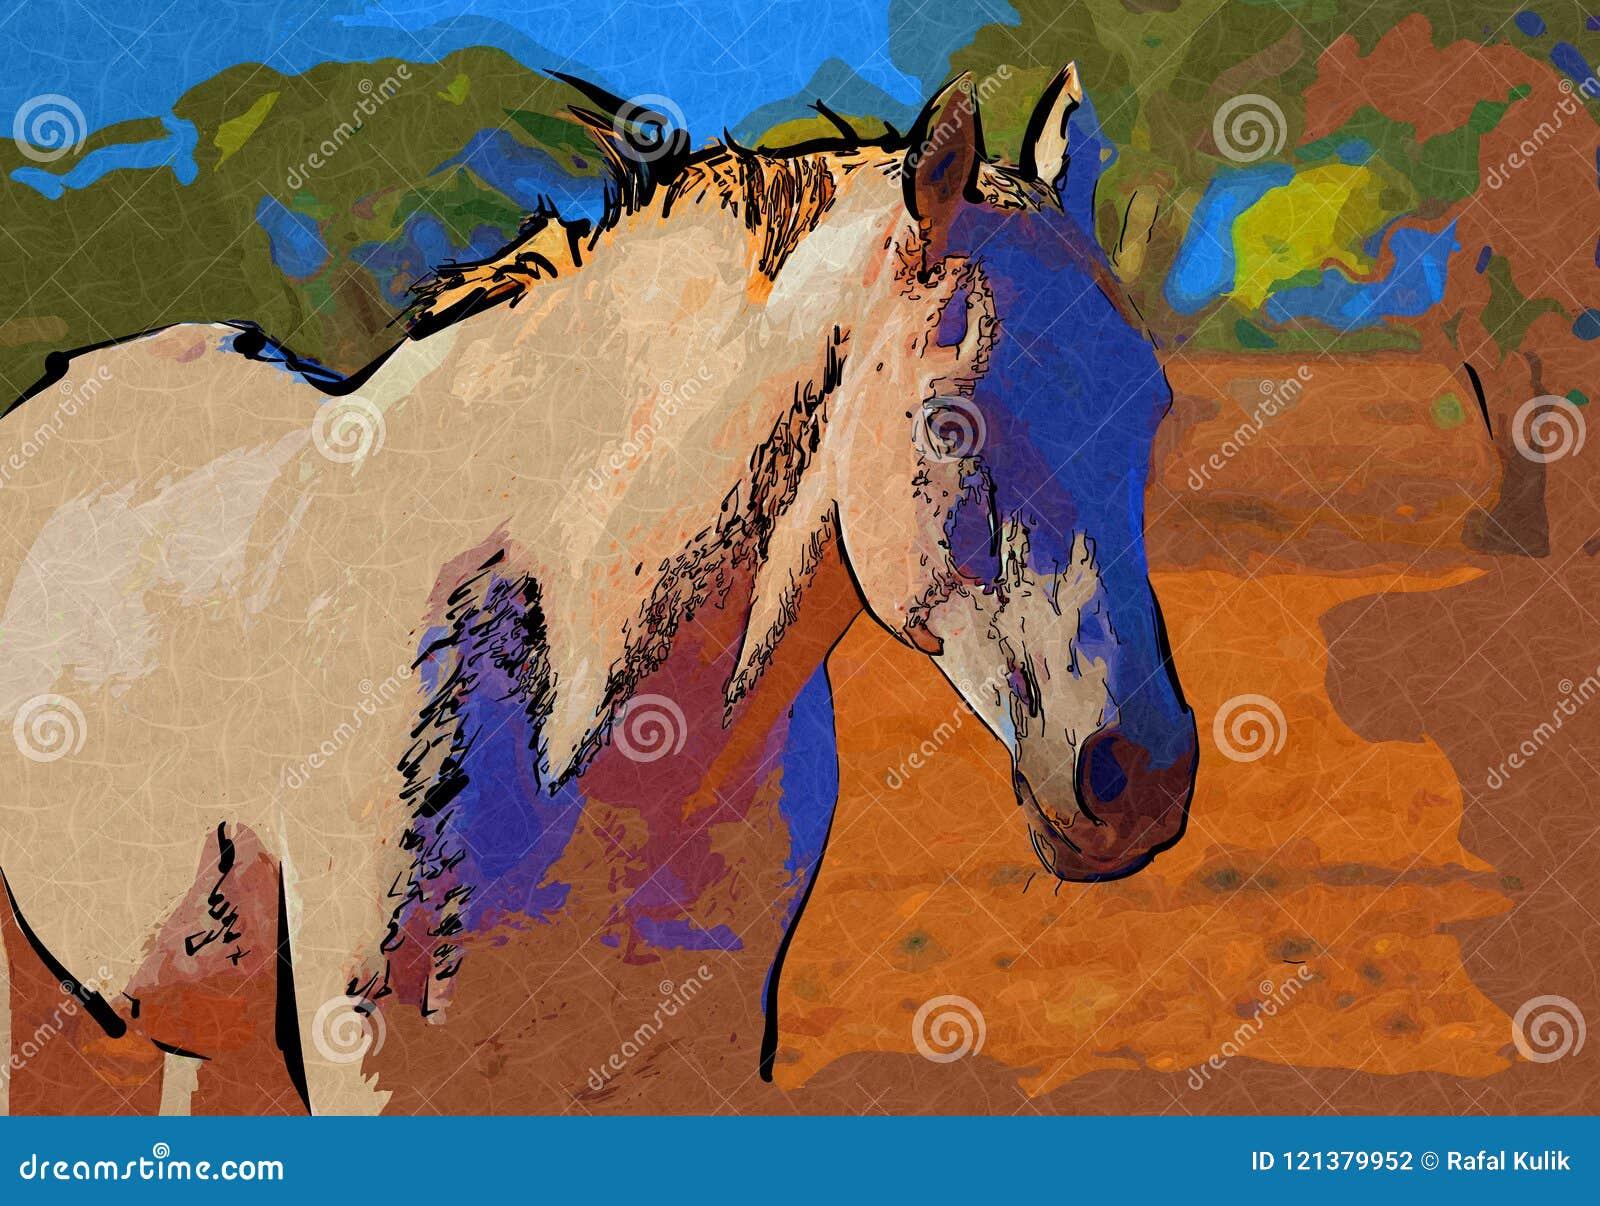 Freehand Horse Head Art Design Illustration Abstract Drawing Stock Illustration Illustration Of Monochrome Faded 121379952